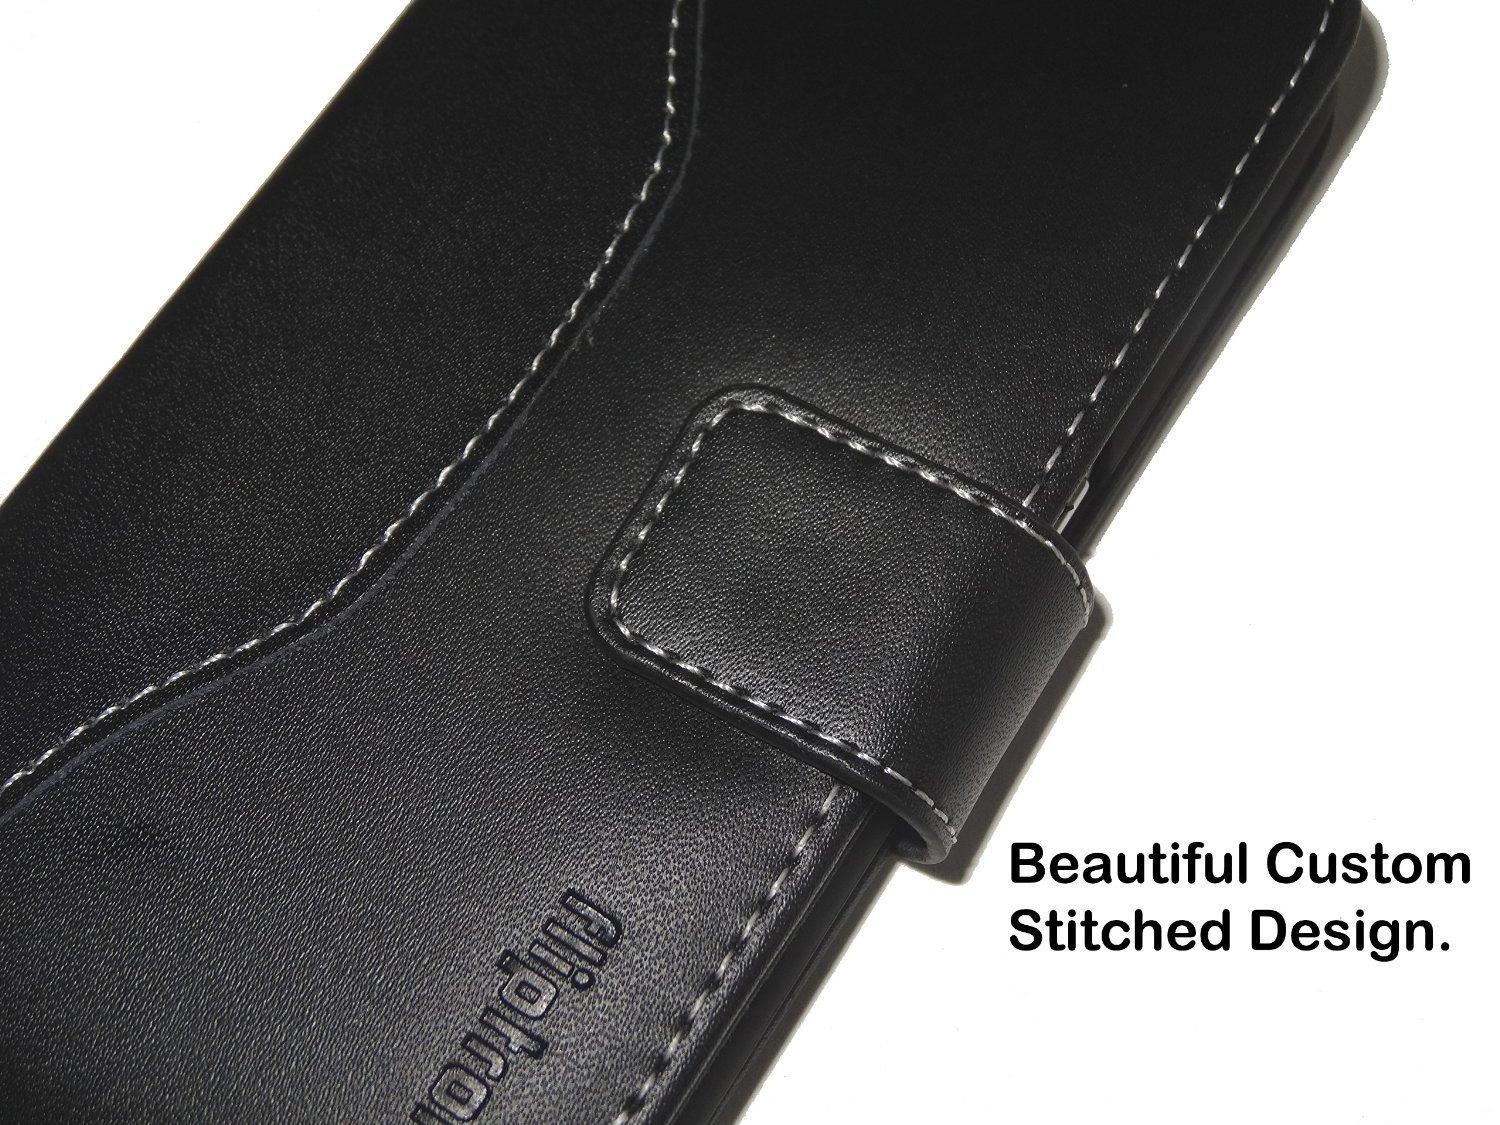 Fliptroniks Galaxy Note 4 Folio Case Top 3 Benefits